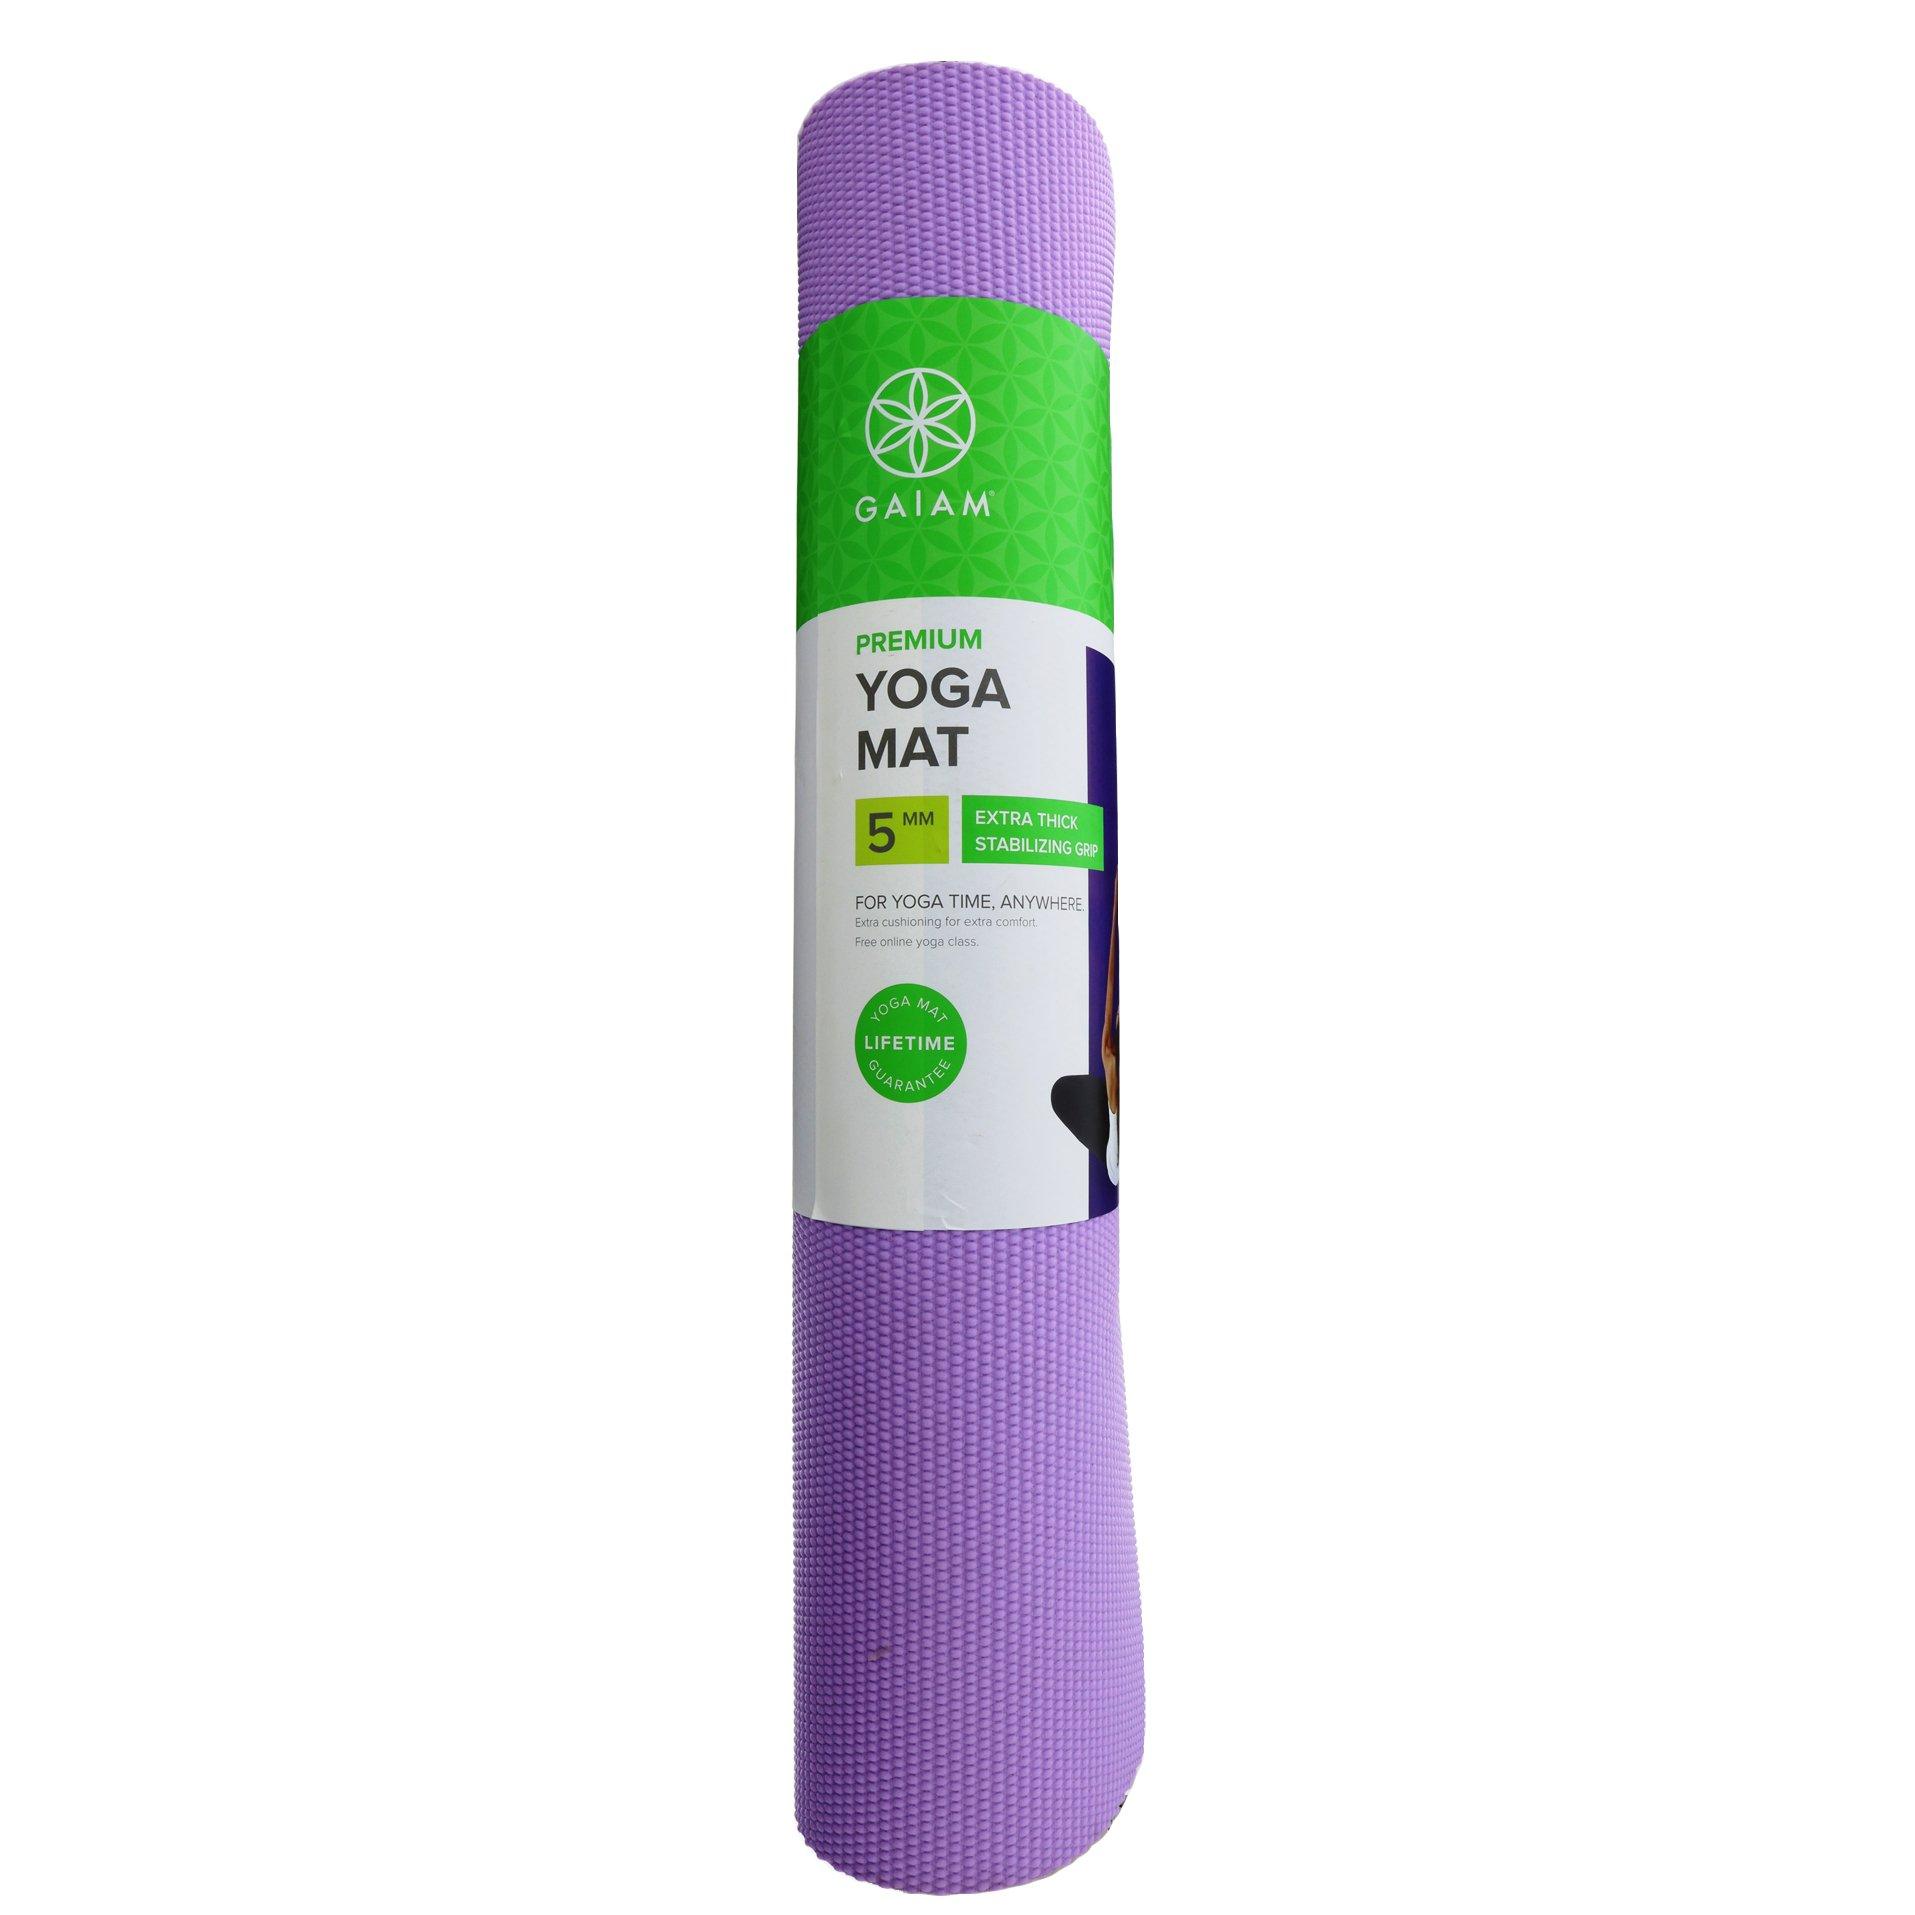 Gaiam Premium Purple Jam Yoga Mat Shop Fitness Sporting Goods At H E B